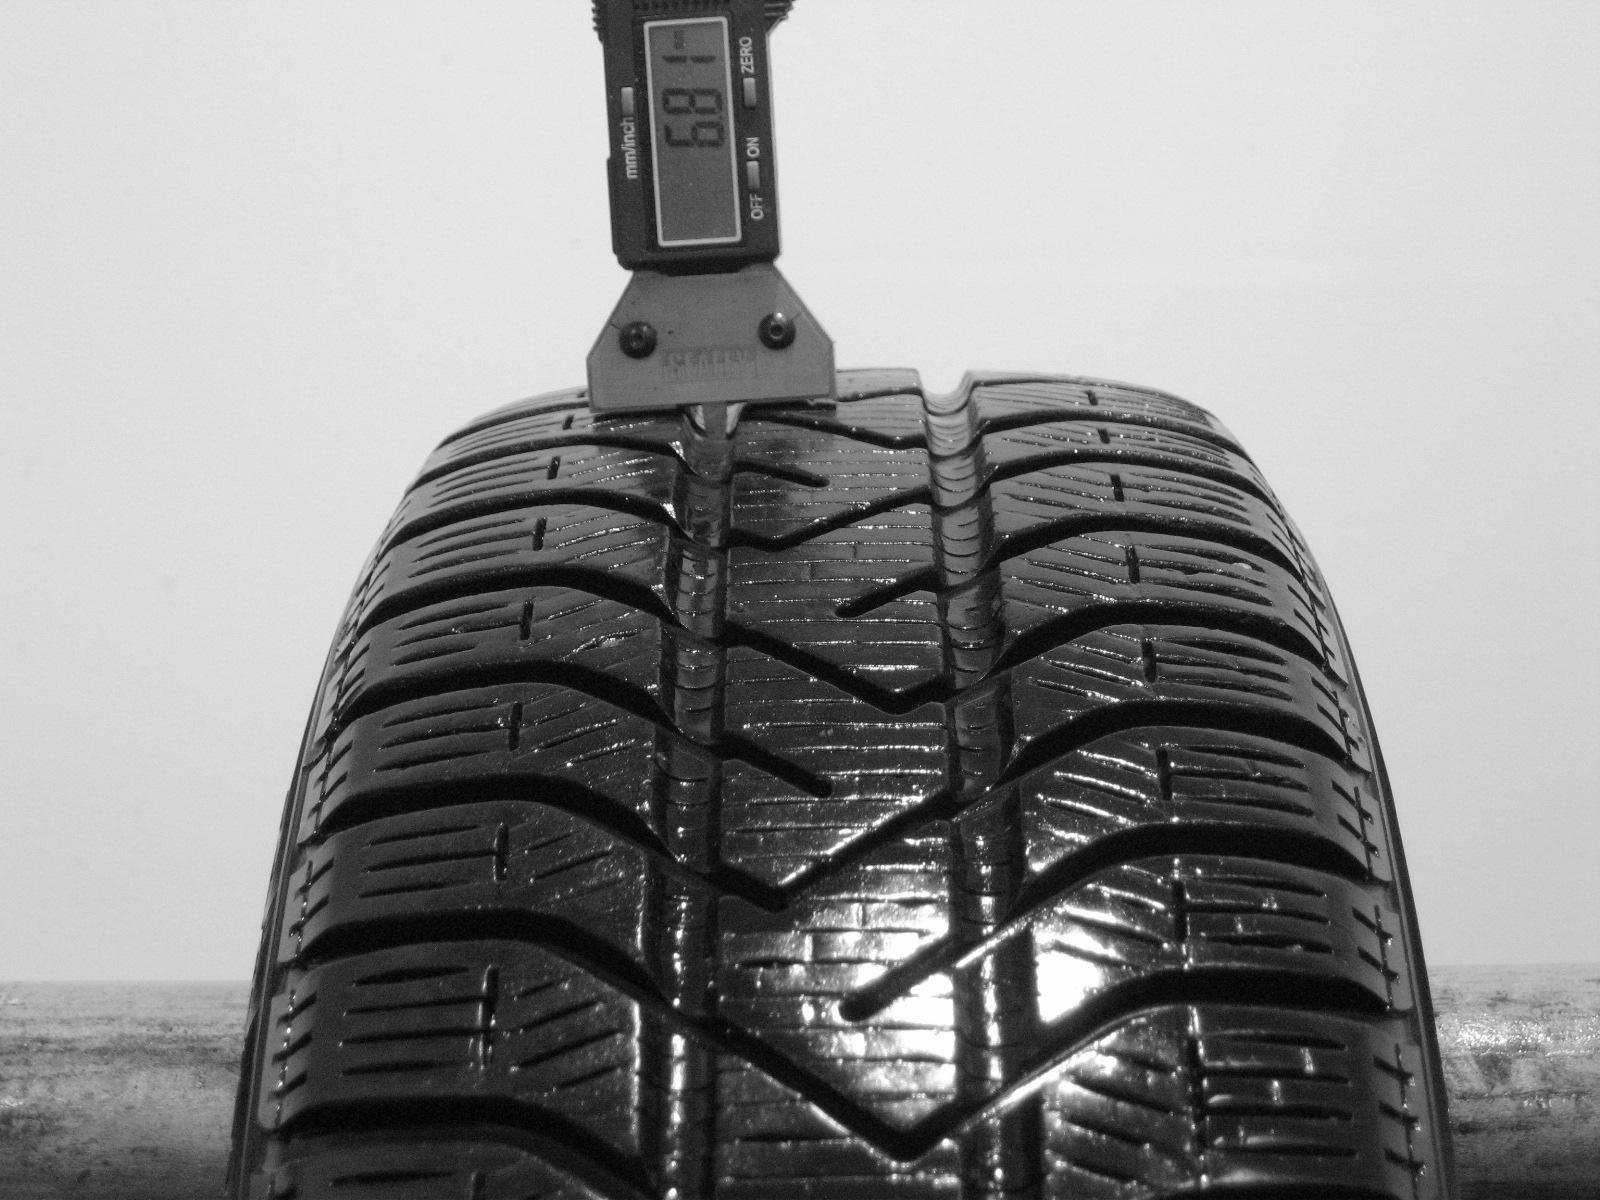 Použité-Pneu-Bazar - 185/65 R14 PIRELLI WINTER 190 SNOWCONTROL serie II -kusovka-rezerva 3mm